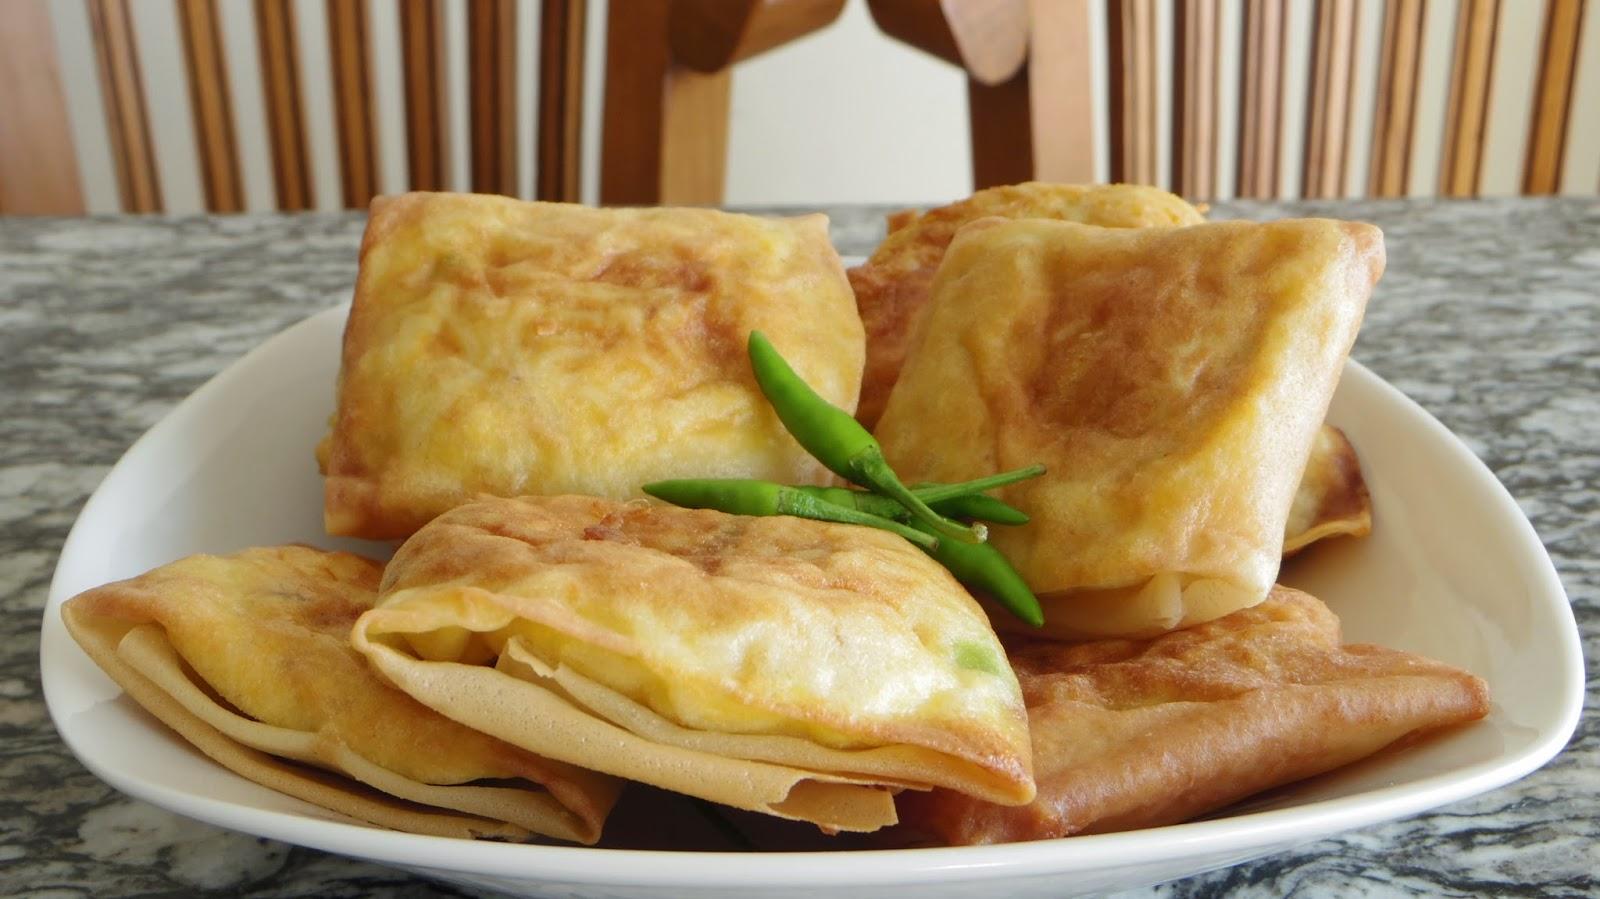 Wirausaha Kuliner: Resep Martabak Telor Paling Sederhana